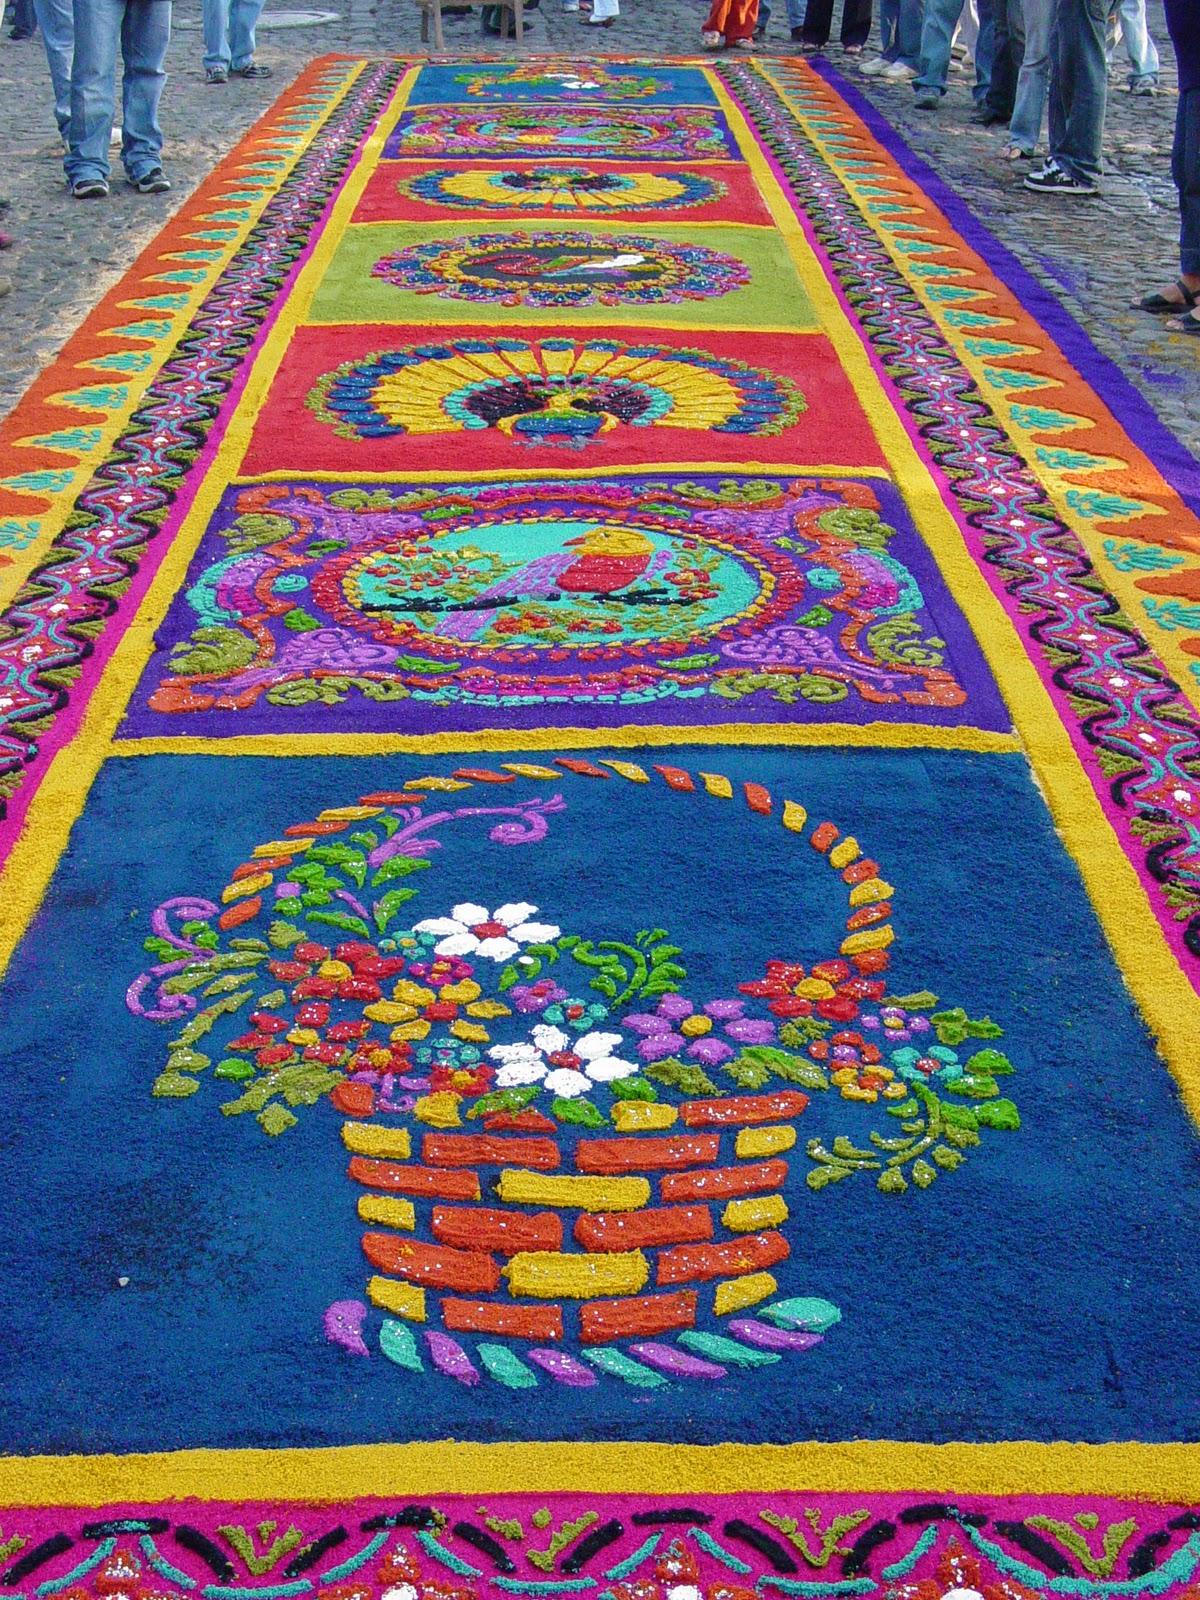 Guatemala en fotografia tradiciones semana santa for Alfombras turcas antiguas